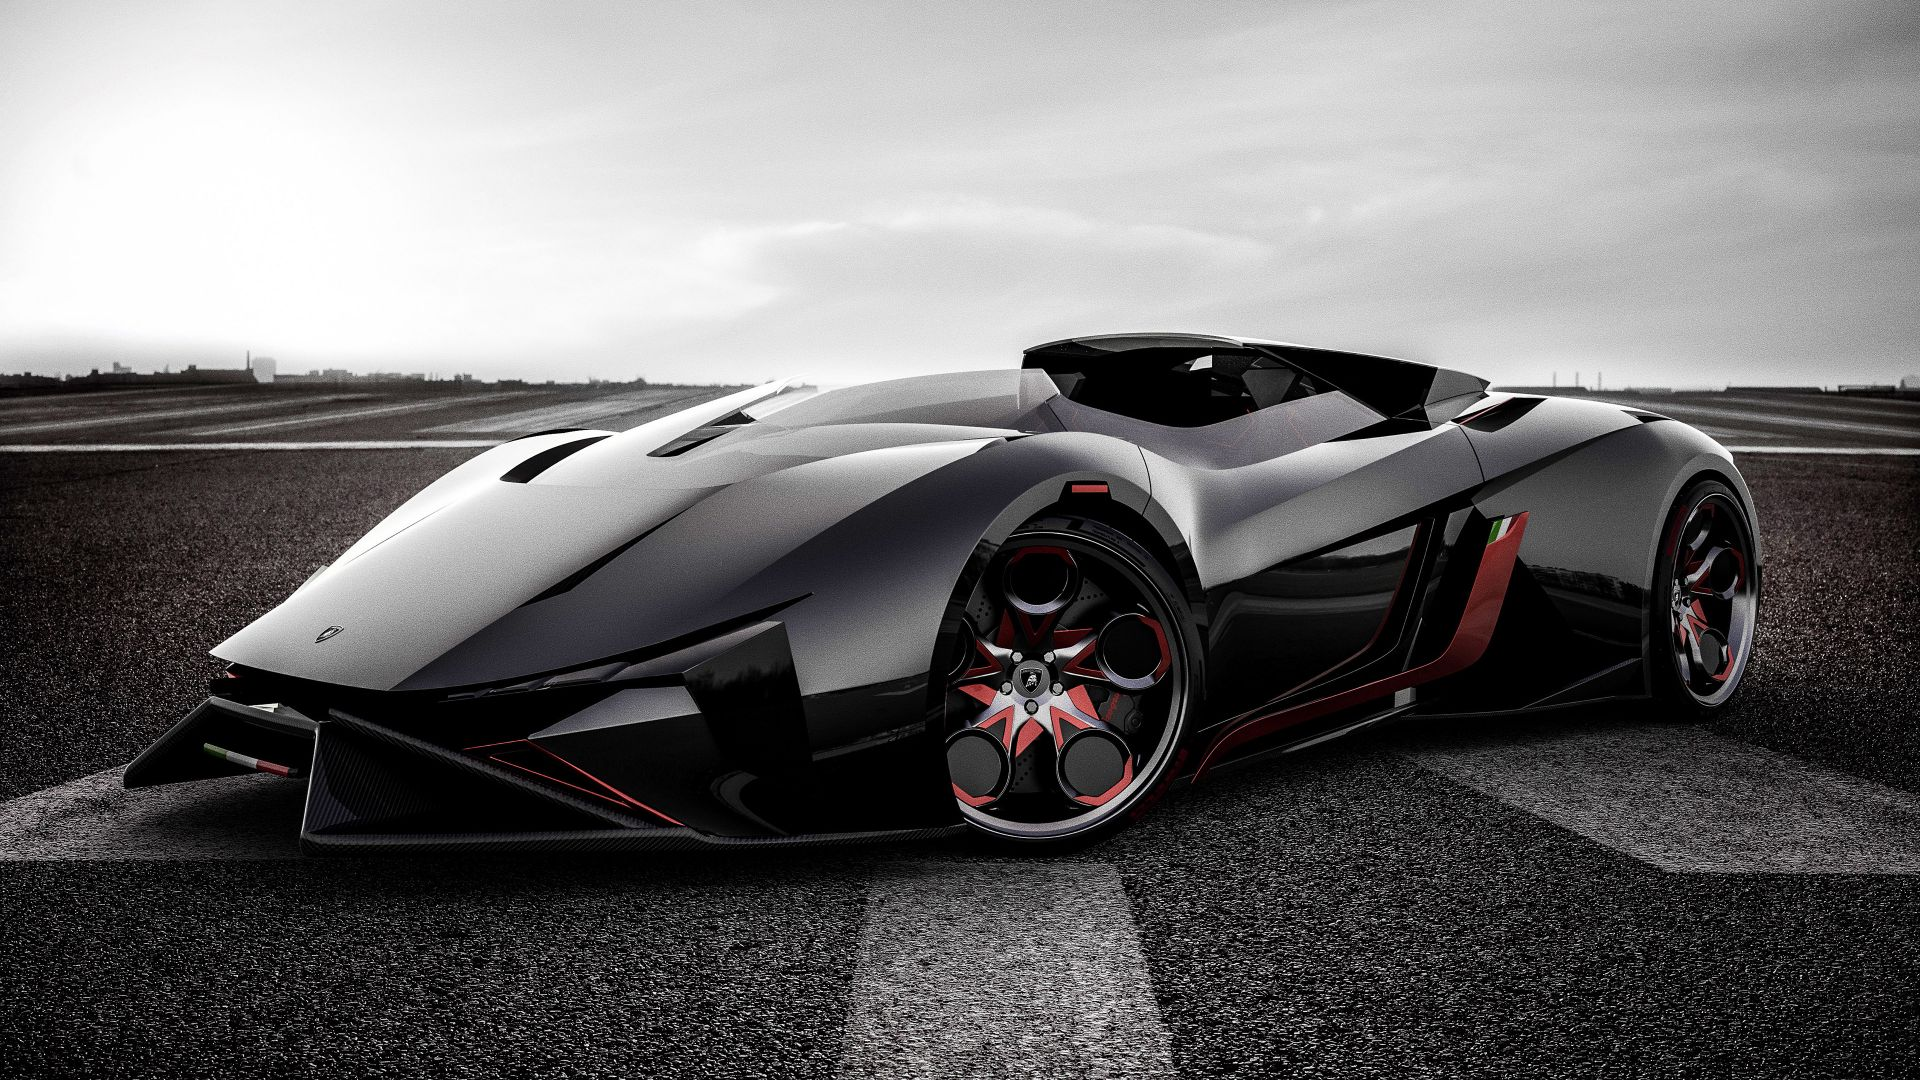 Desktop Wallpaper Lamborghini Diamante, Sports Car ...